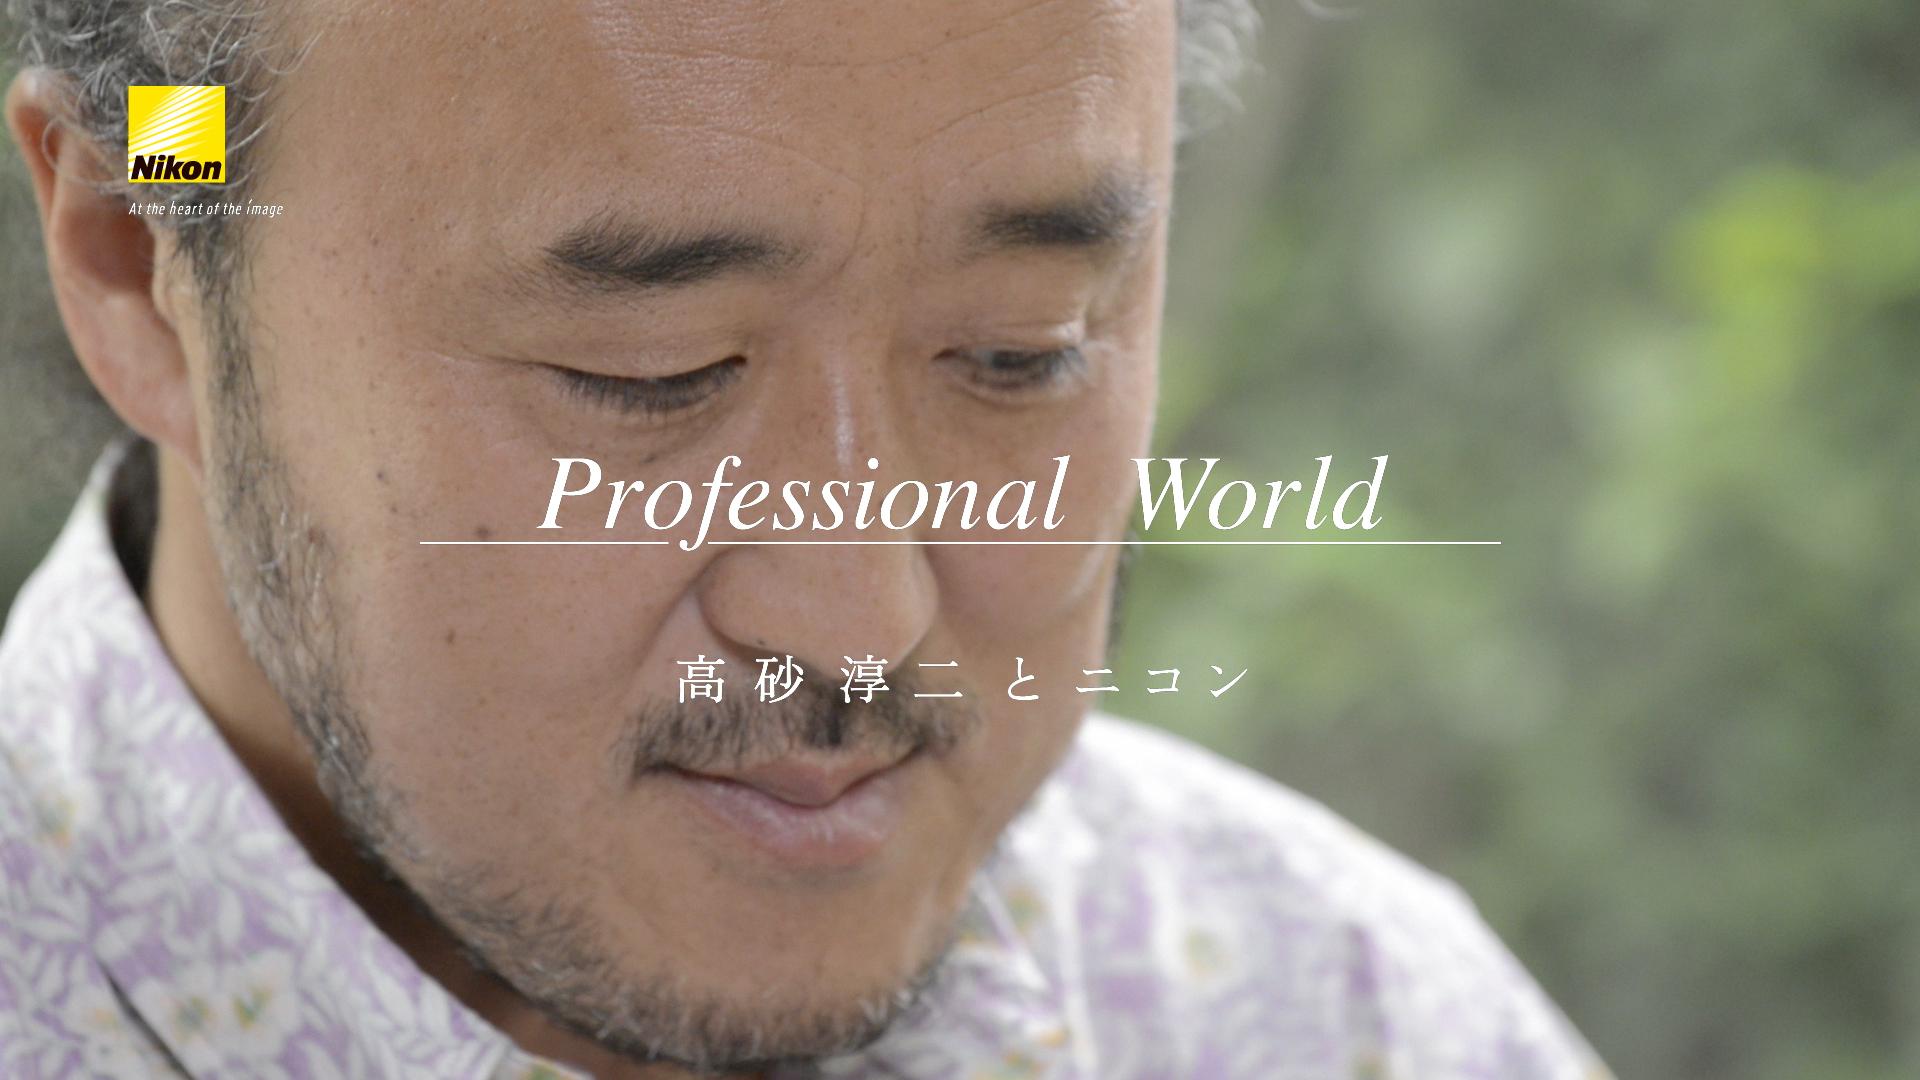 Professional World「高砂淳二とニコン」